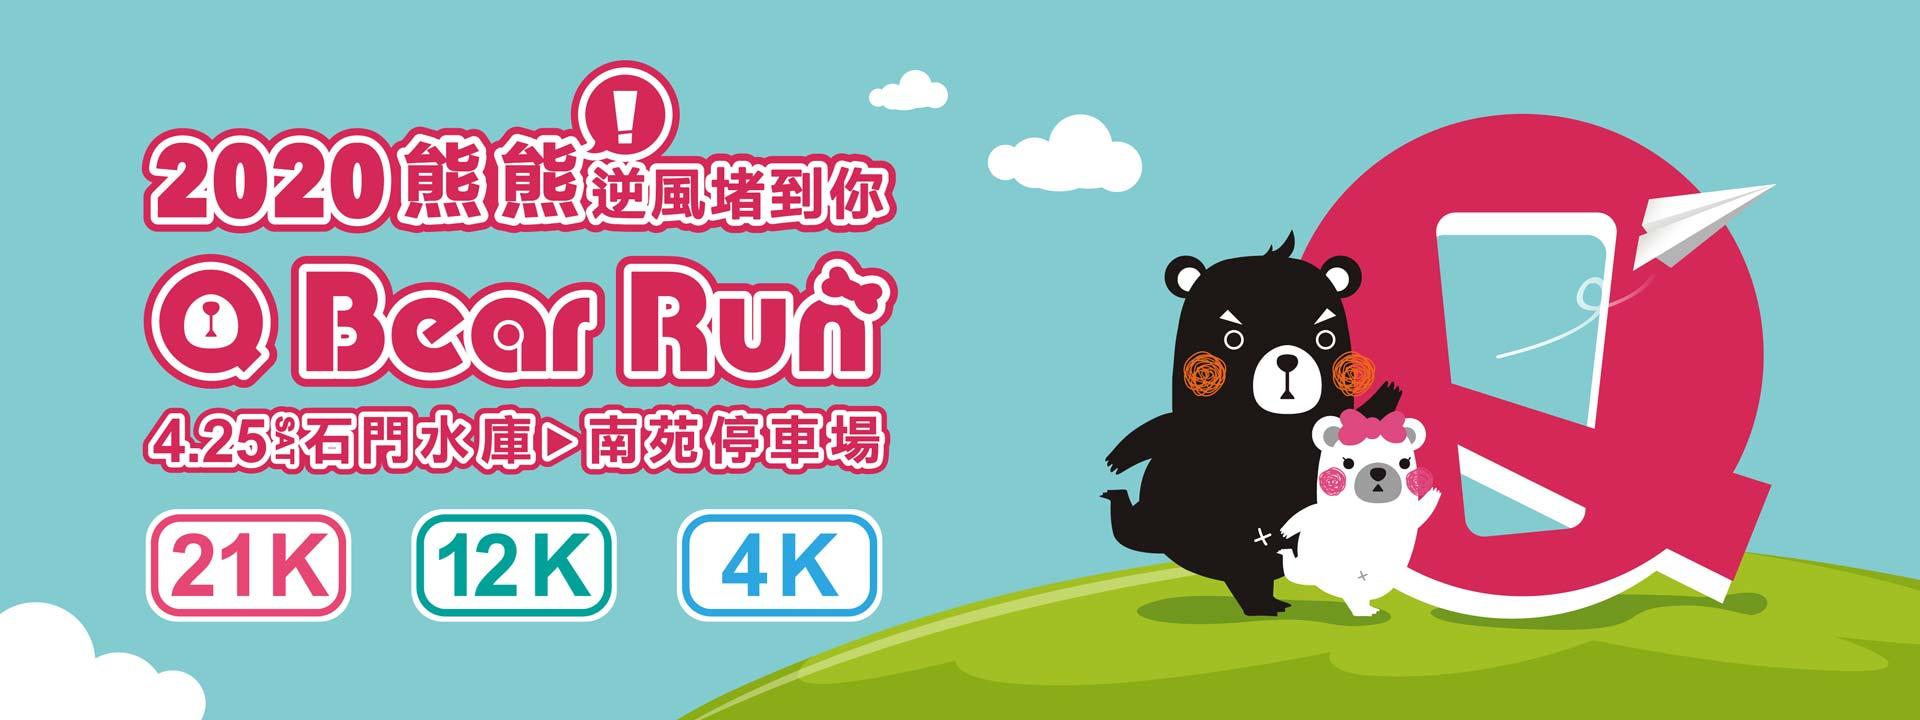 2020 Q Bear Run 熊熊逆風堵到你